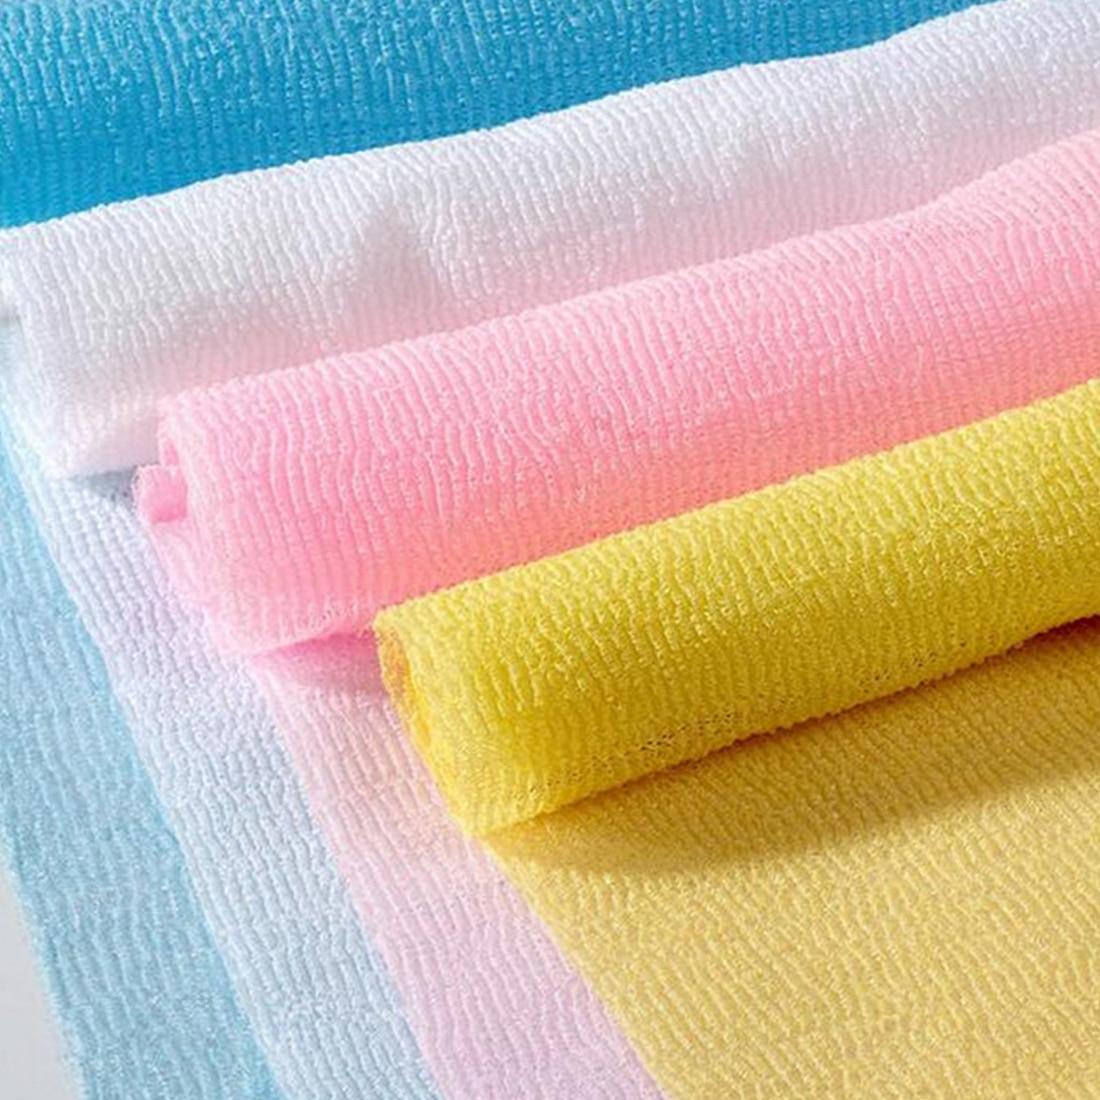 Hot Nylon Scrubbing Cloth Towel Bath Shower Body Cleaning Washing Sponges Scrubbers Bathroom Tool